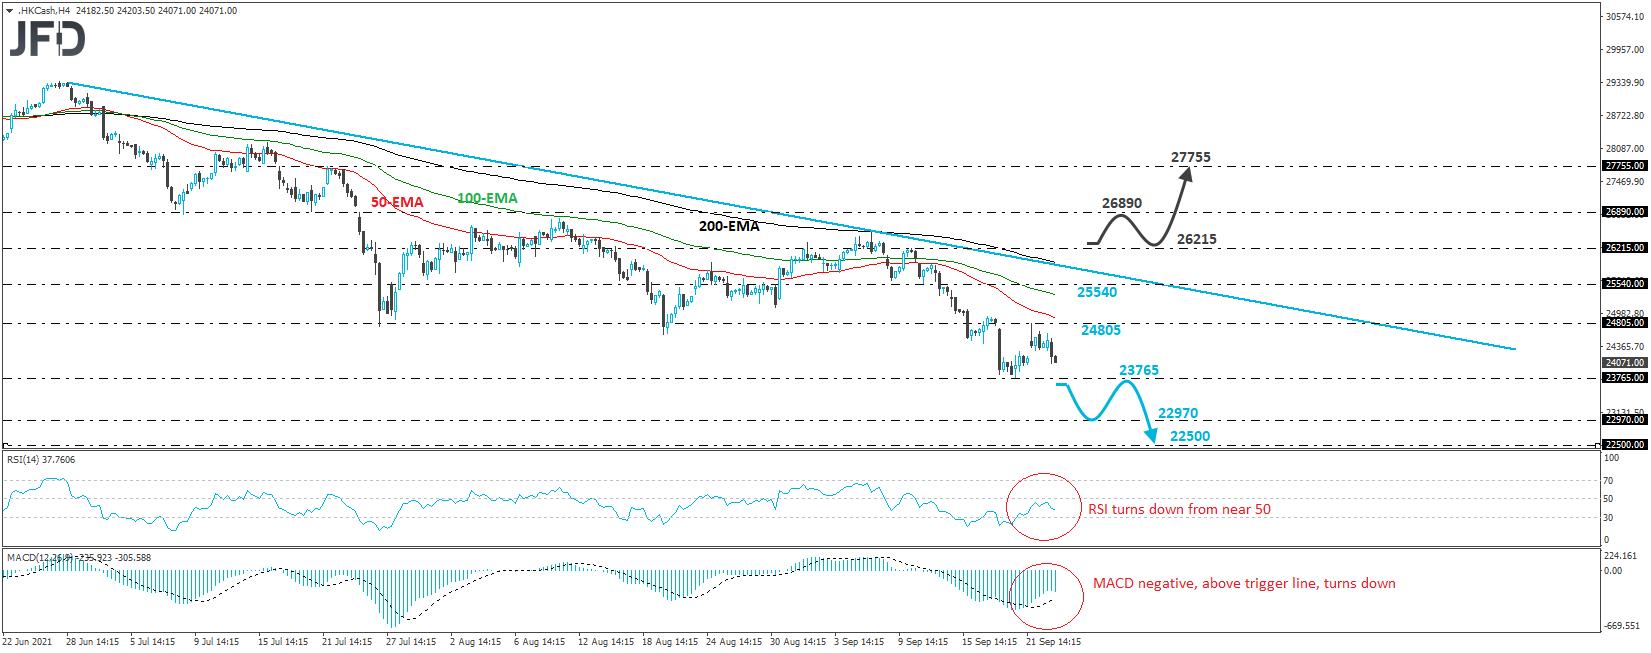 Hong Kong Hang Seng 4-hour chart technical analysis